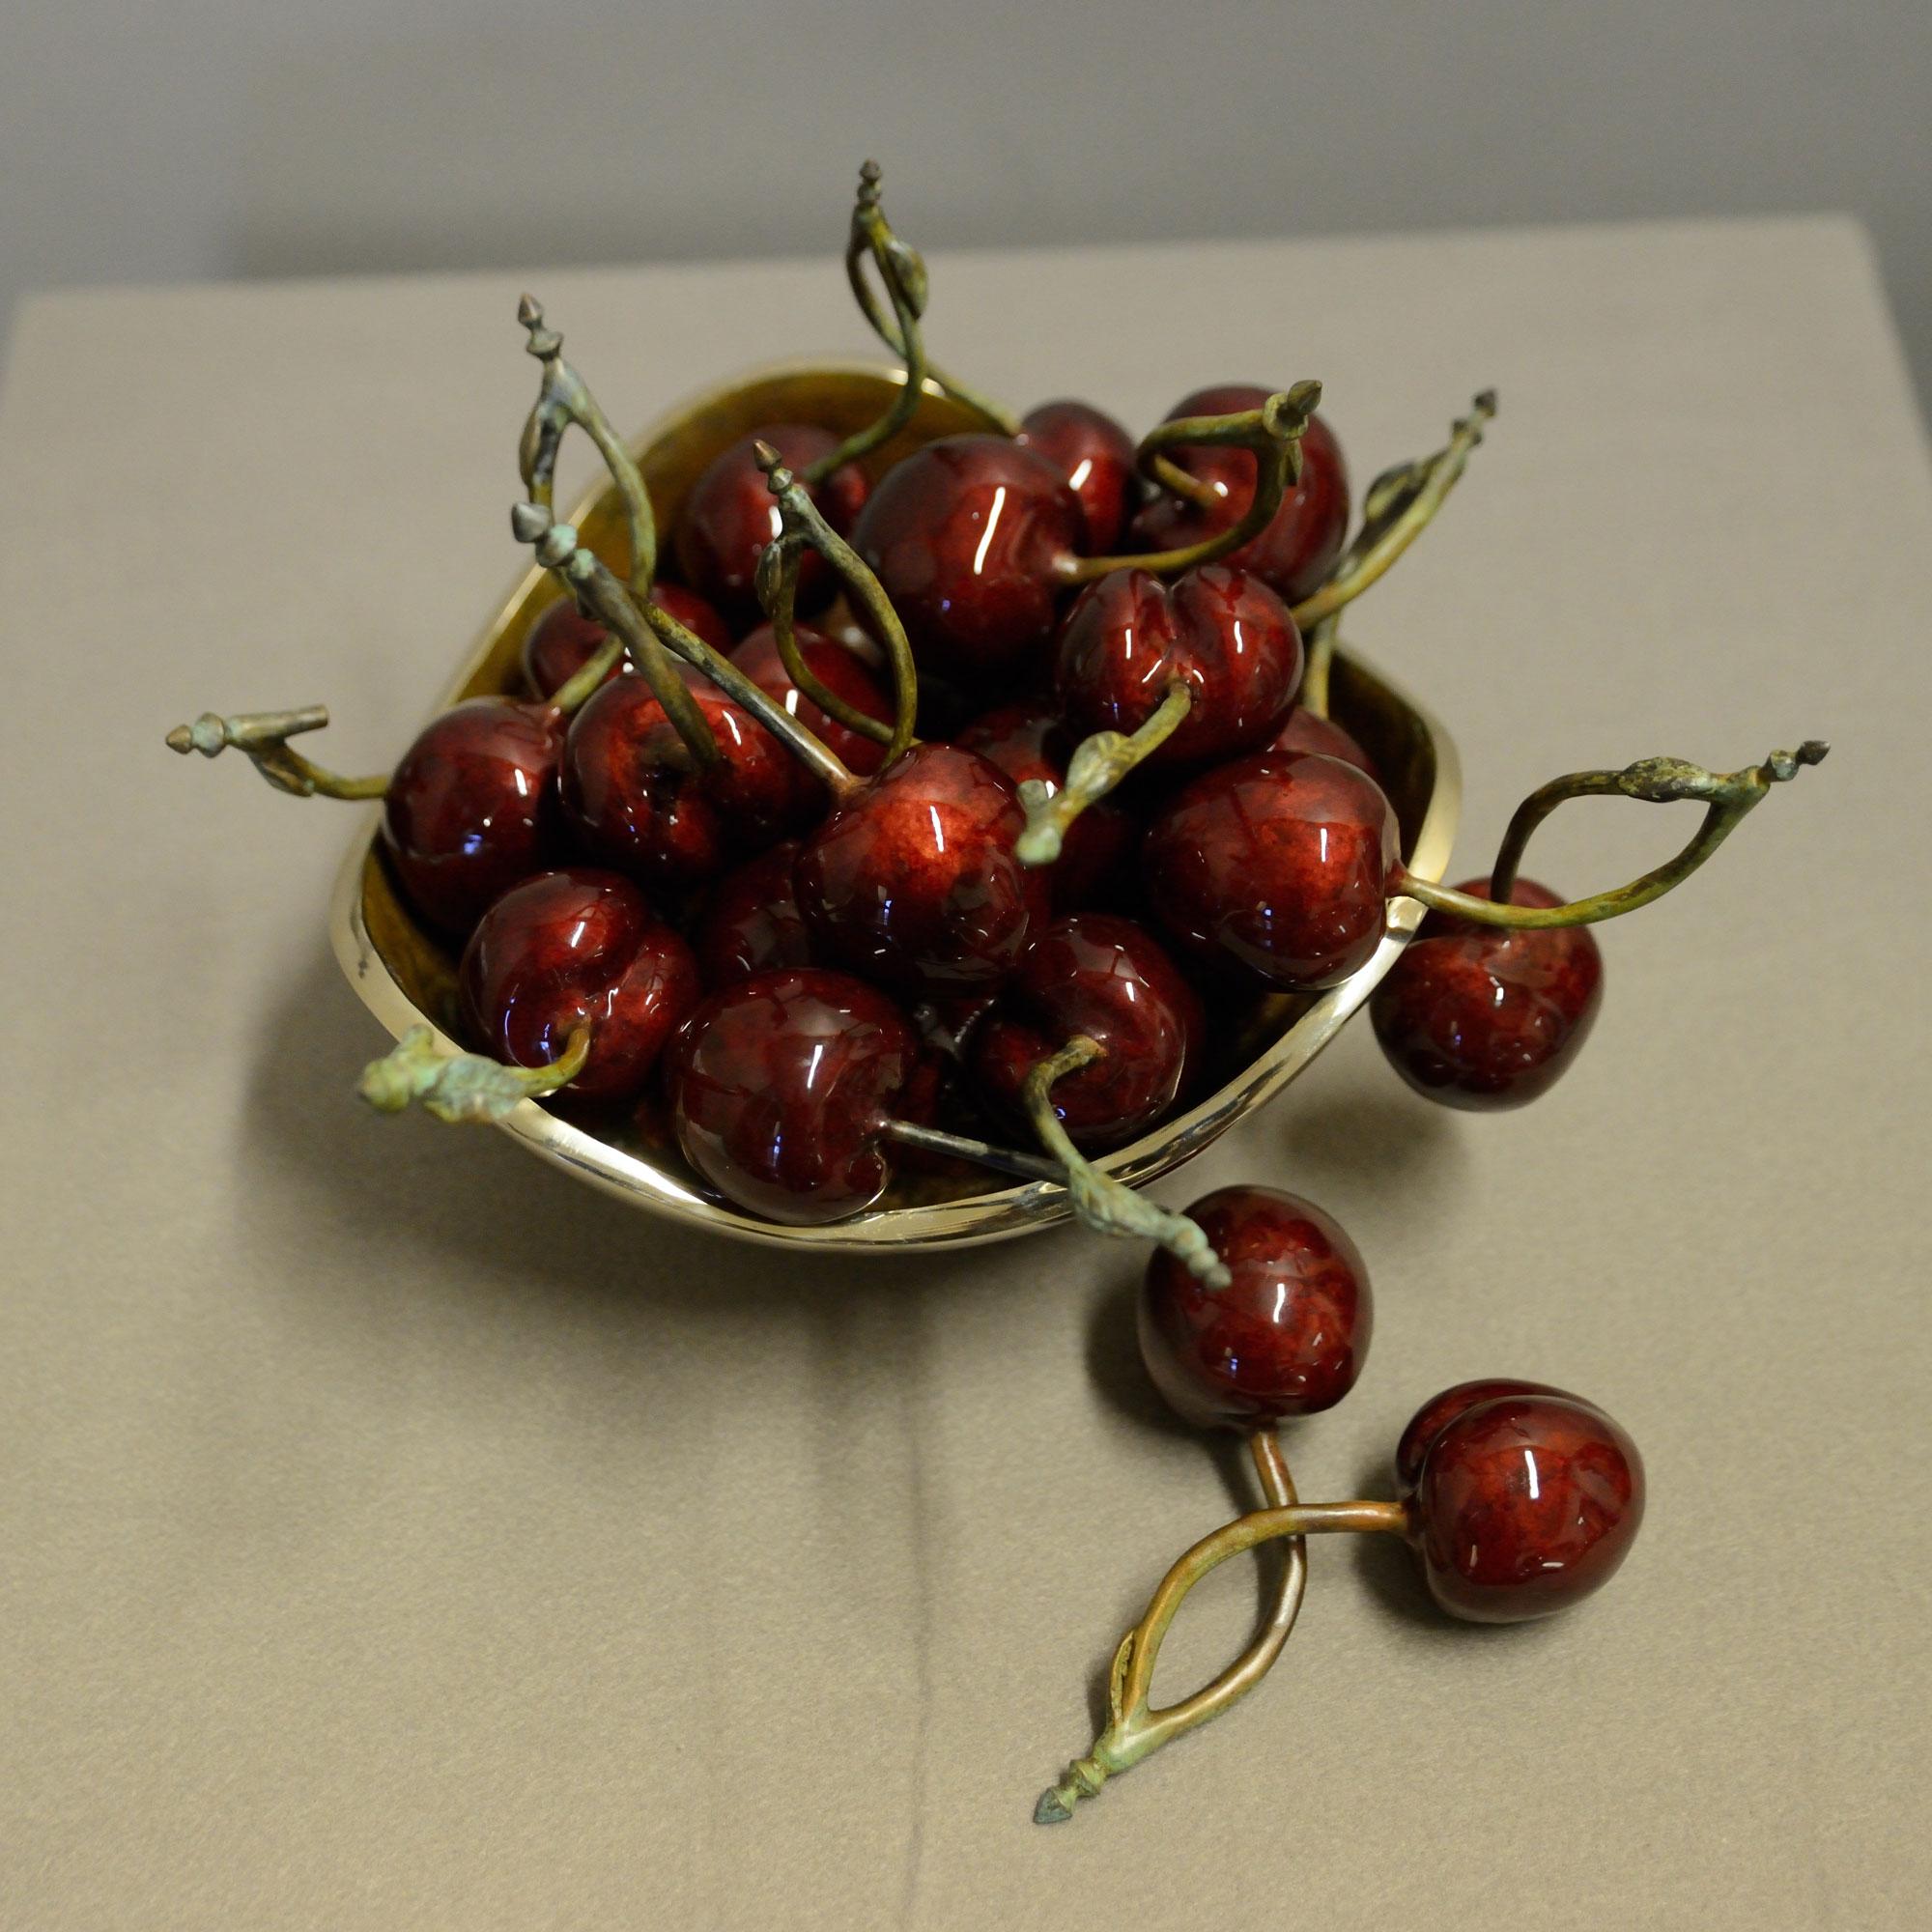 bowl-of-cherries-top